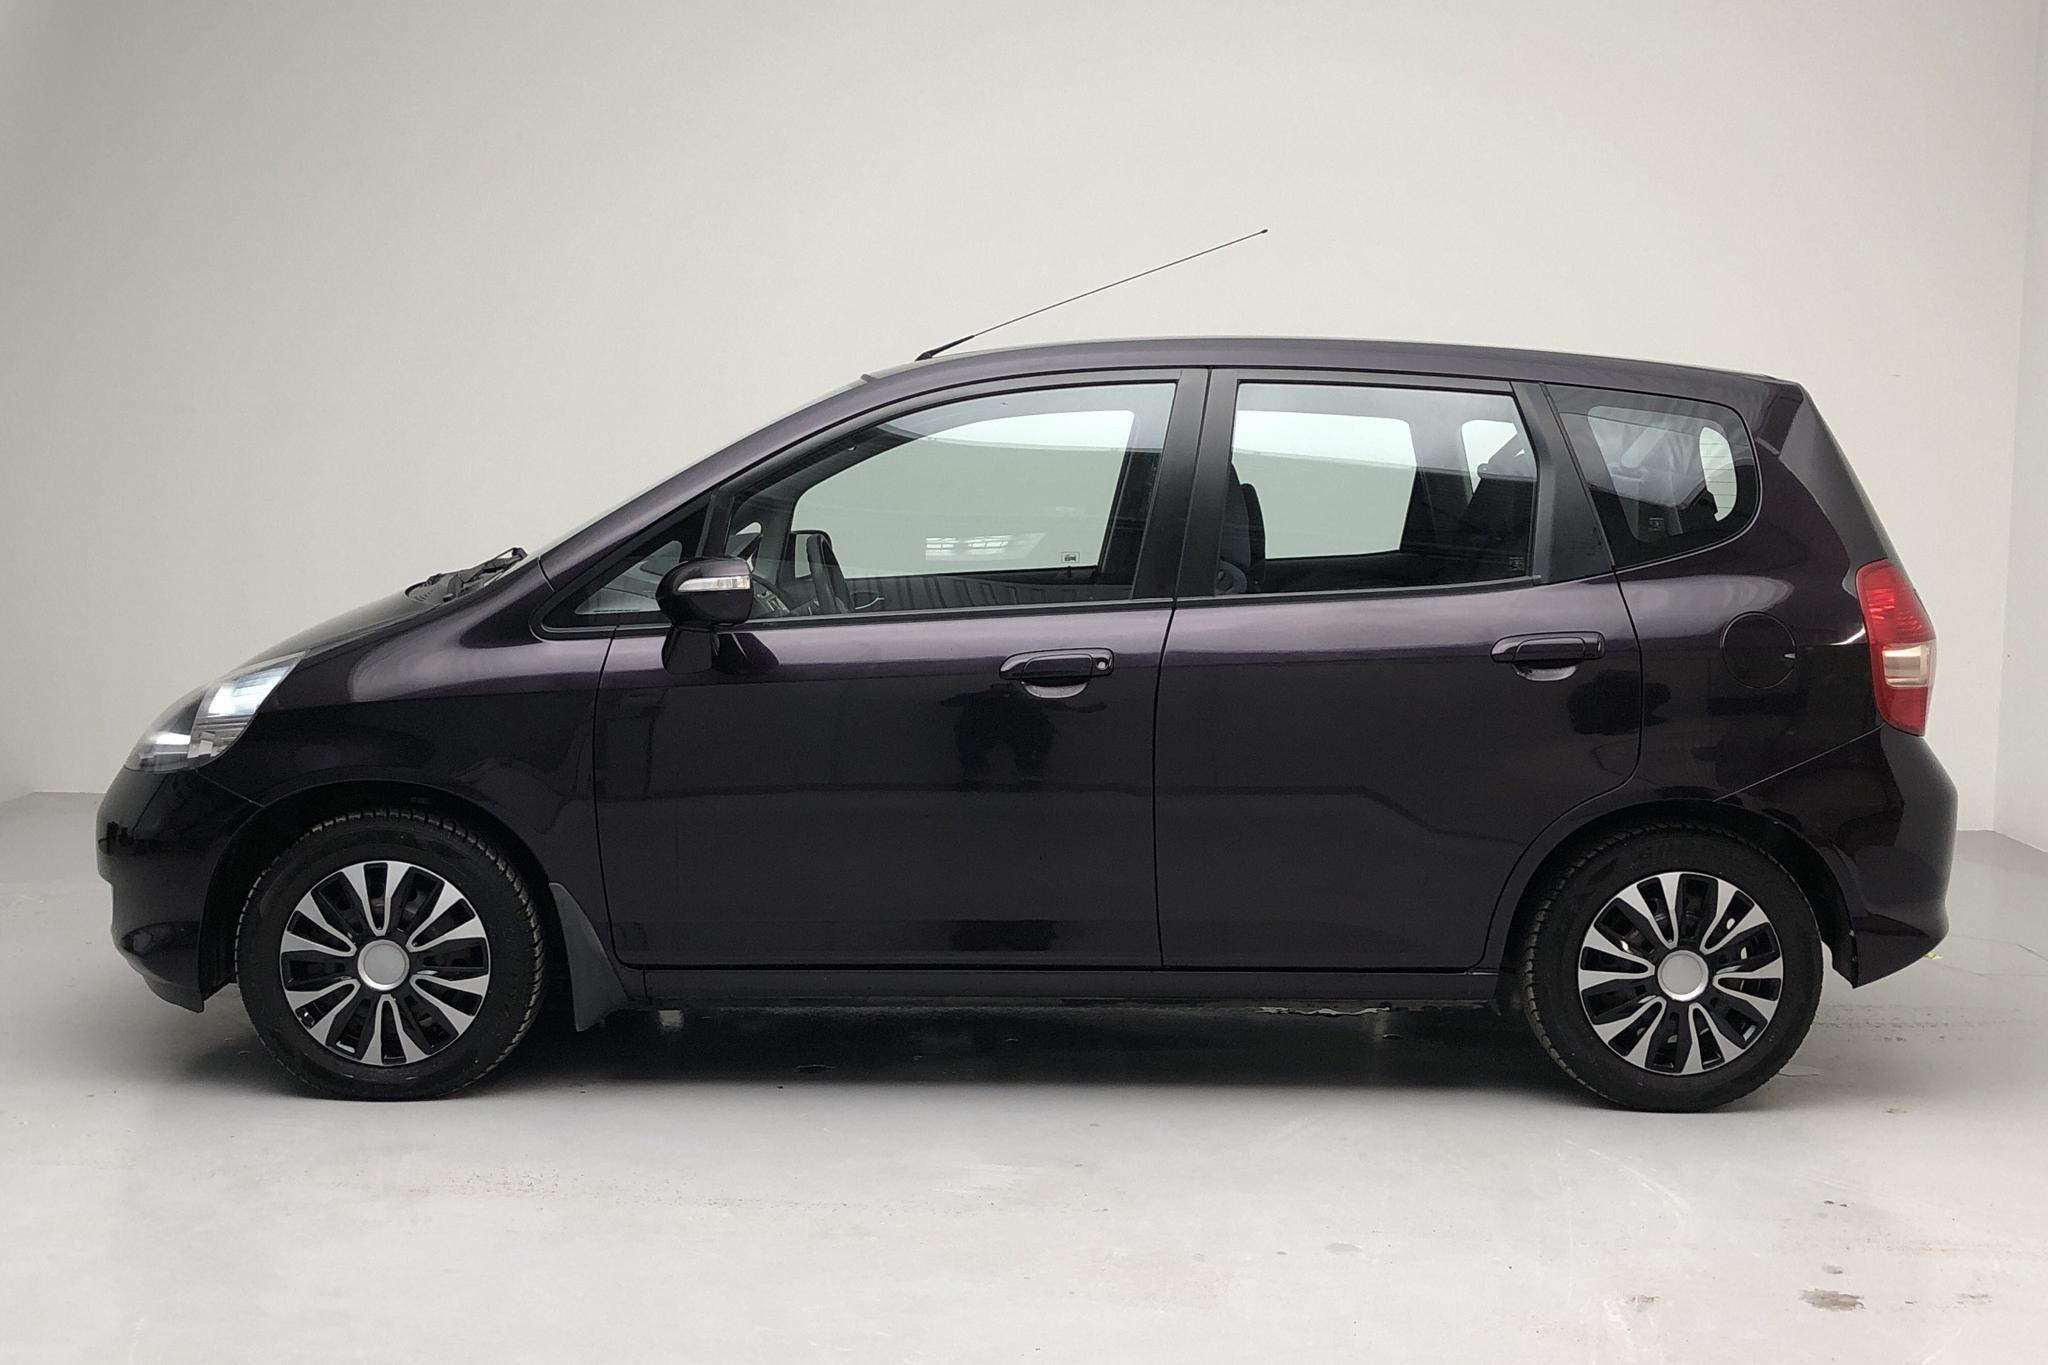 Honda Jazz 1.4 (83hk) - 142 050 km - Automatic - black - 2007